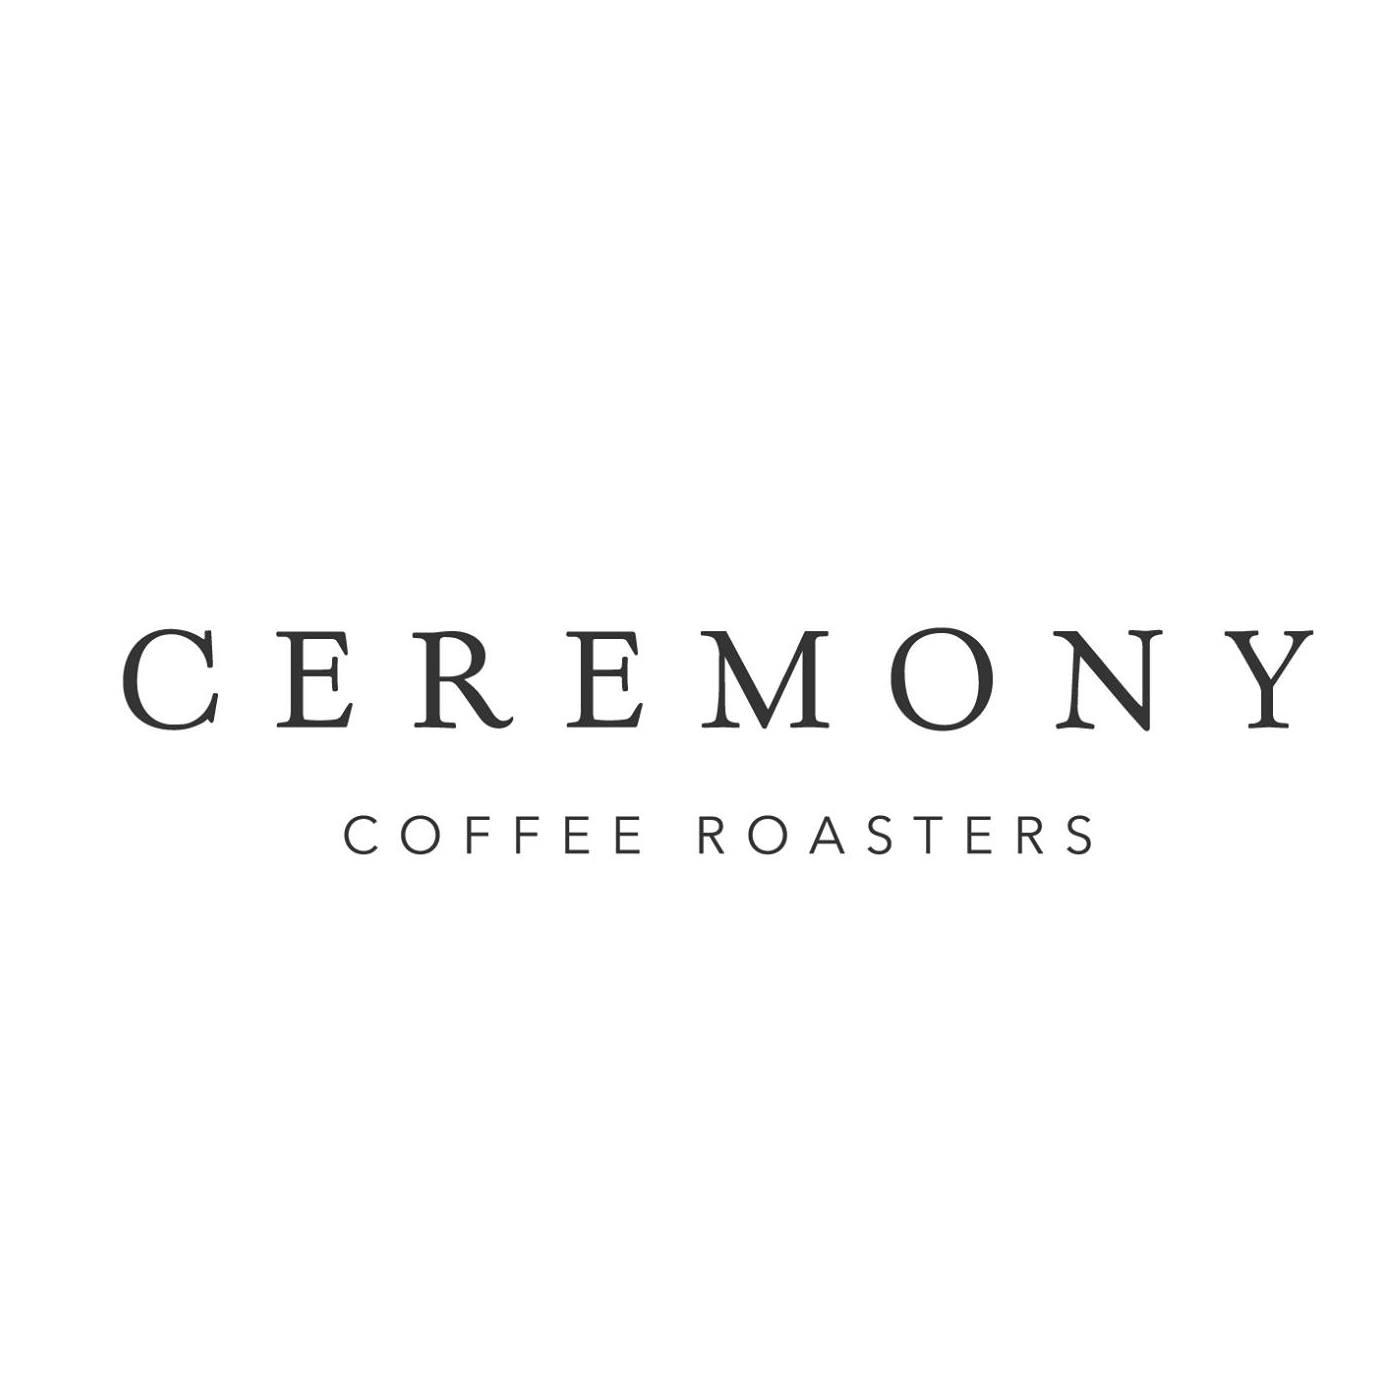 Ceremony Coffee Roasters - Harbor Point